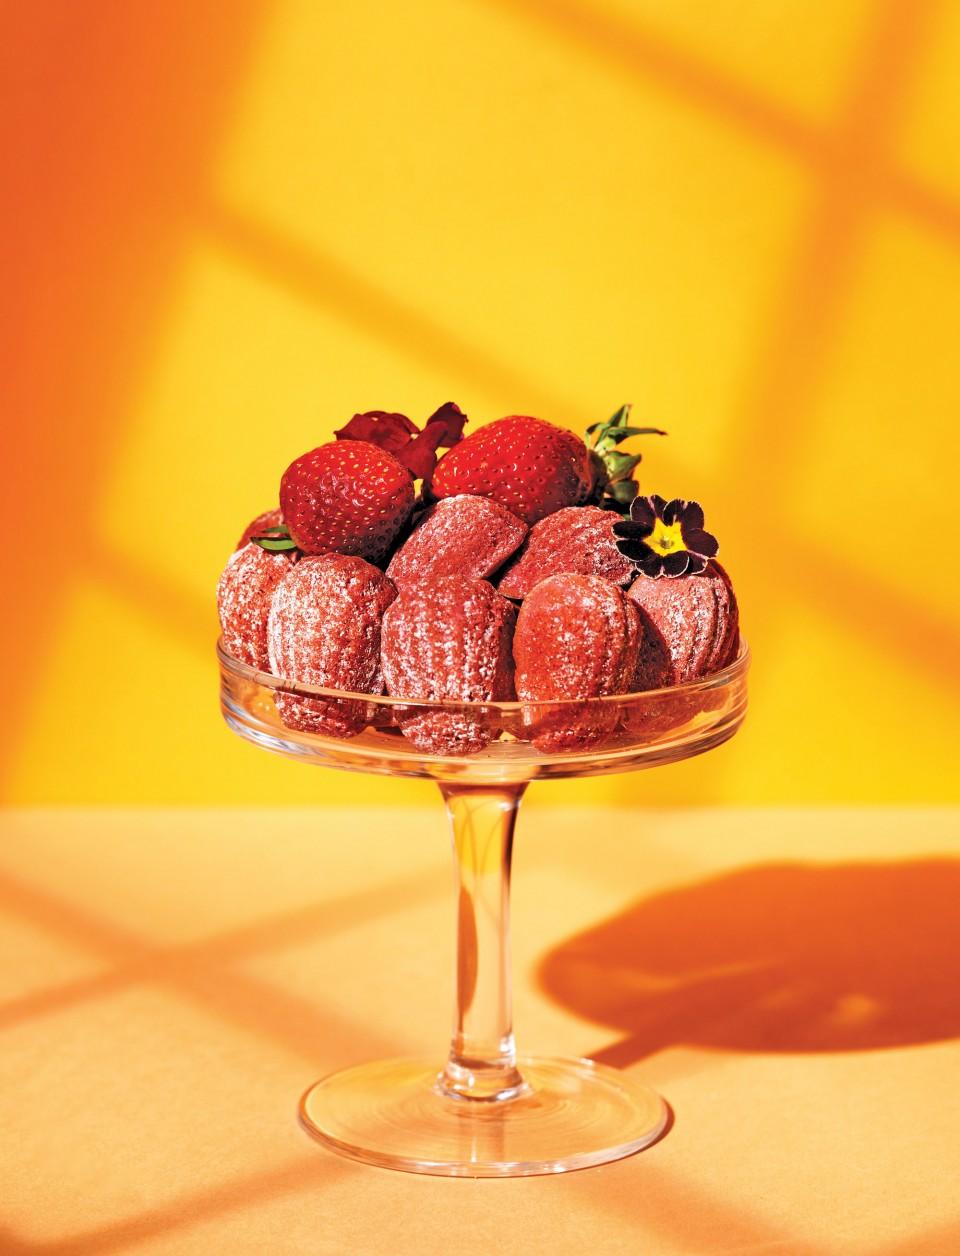 0314-strawberry1-960x1256.jpg